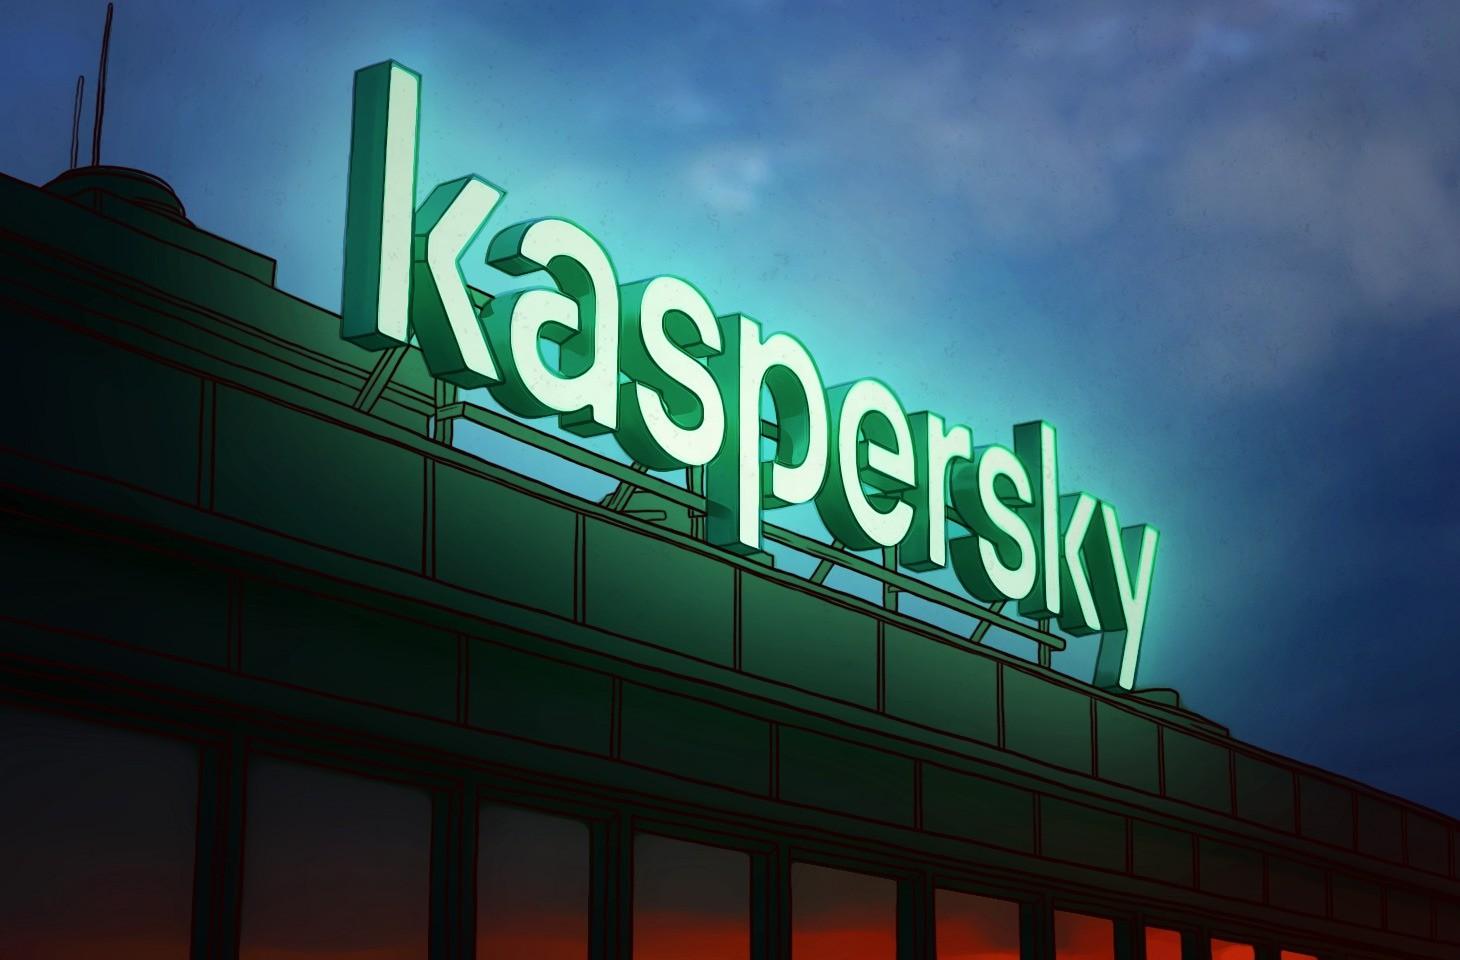 4 ways to hack an ATM | Kaspersky official blog